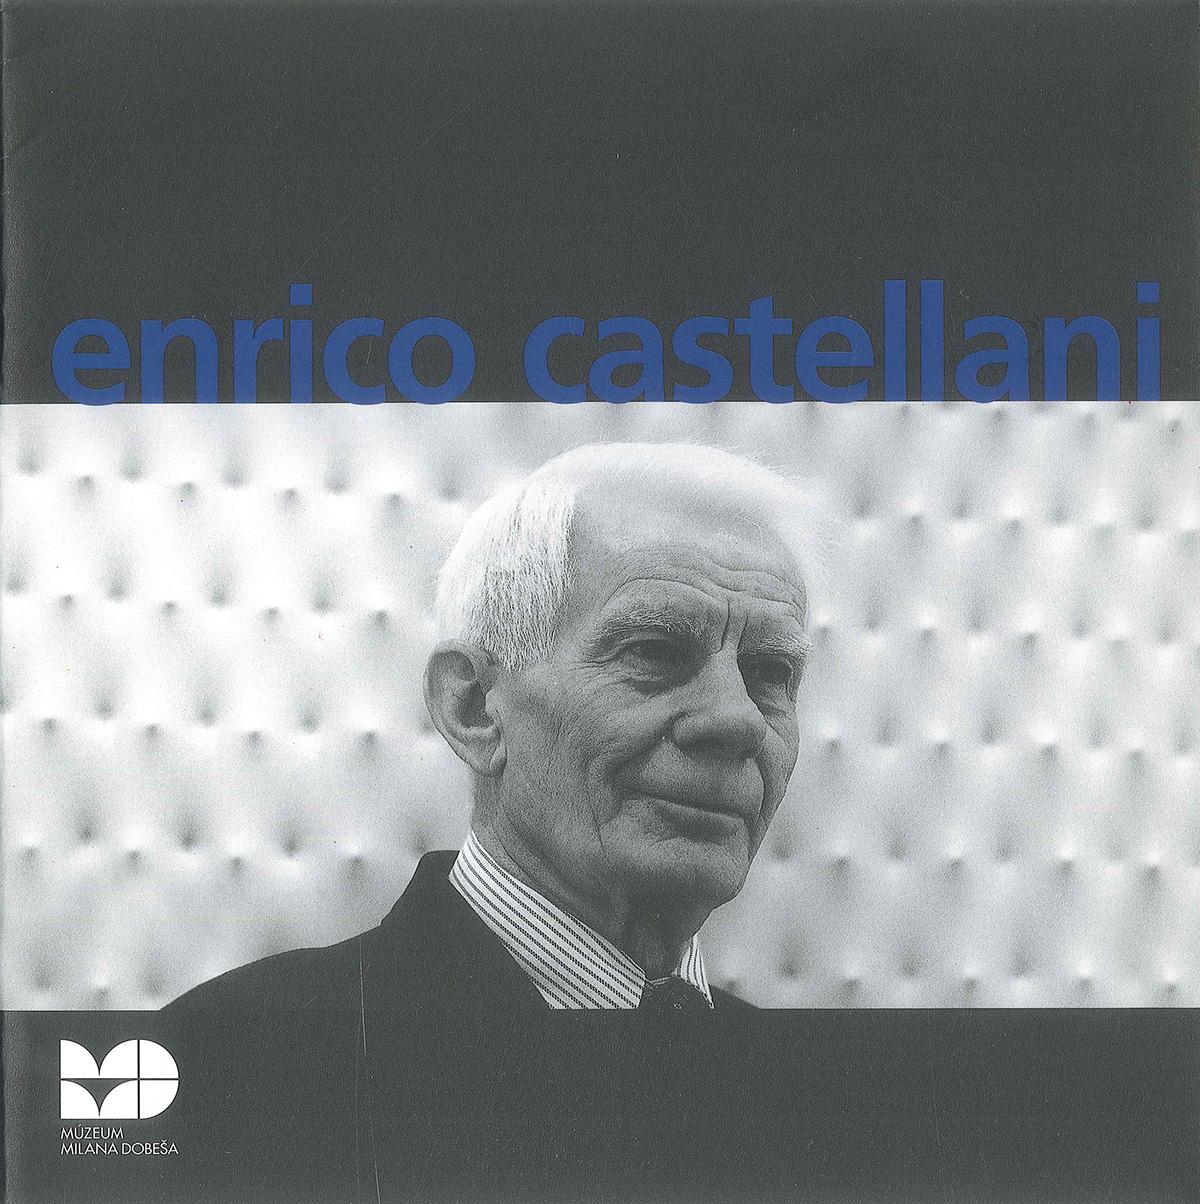 Cover - Enrico Castellani, Rachele Ferrario, 2006, Mùzeum Milana Dobeša, Bratislava (SVK)